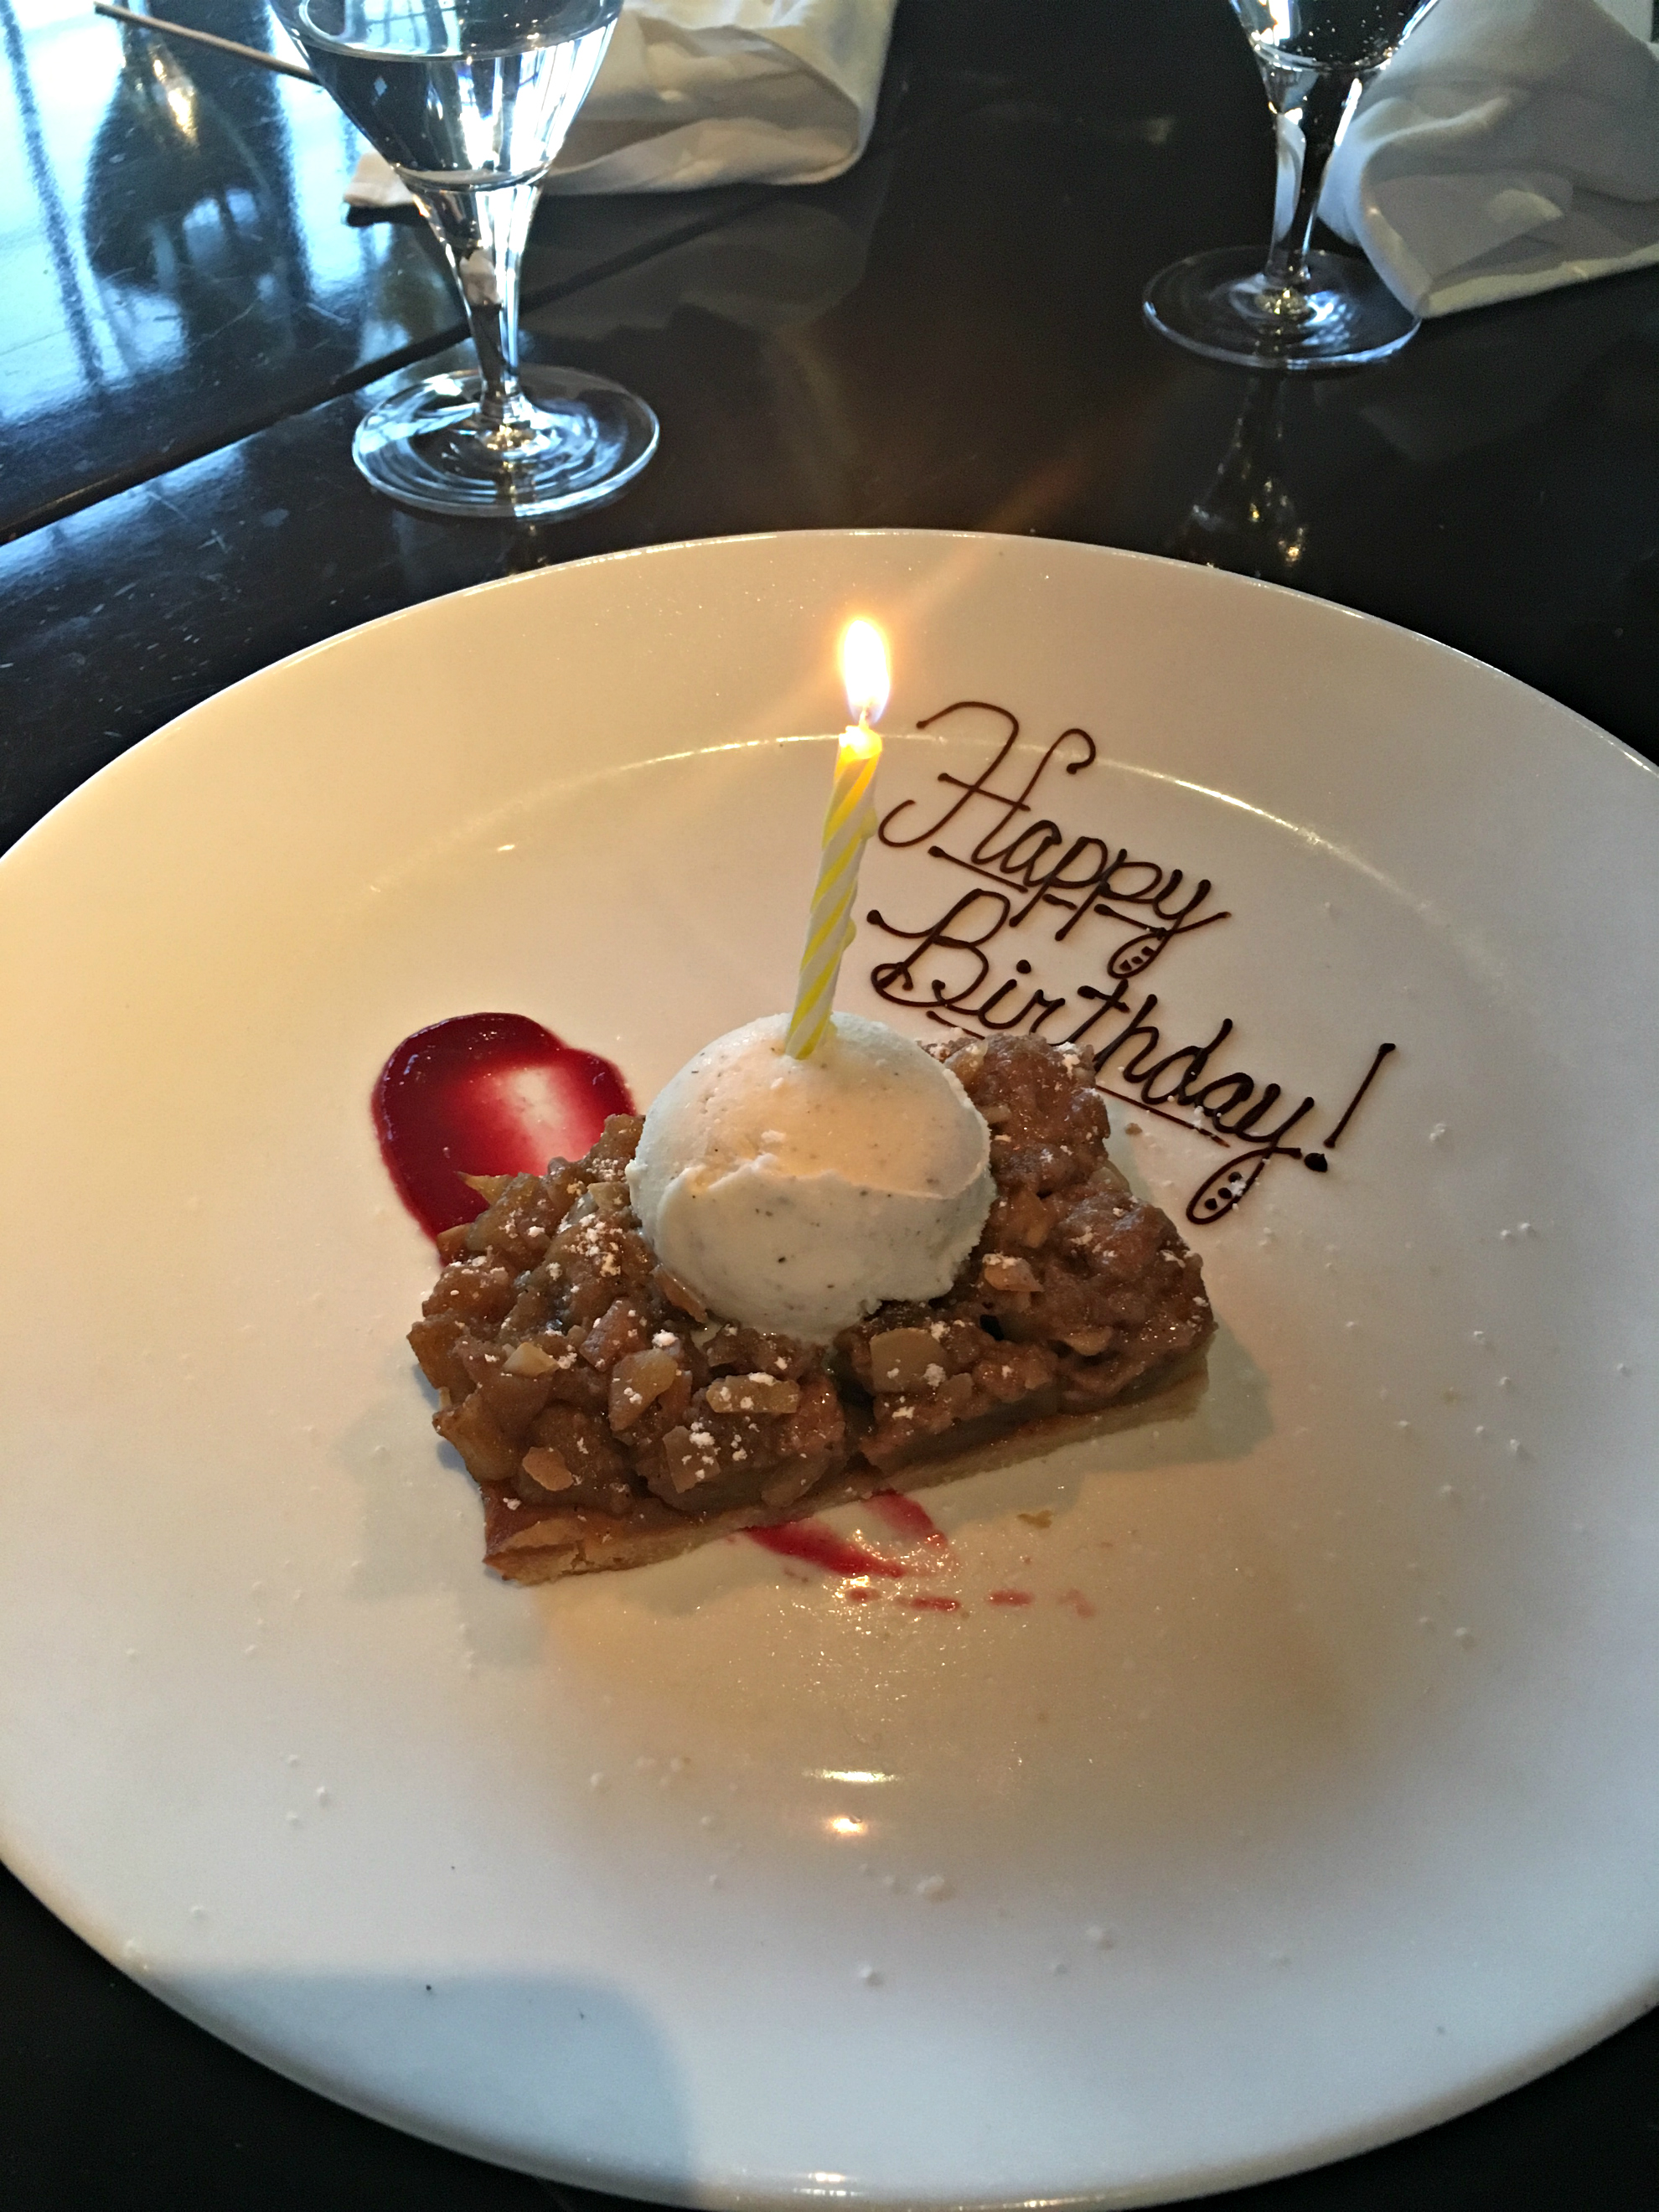 Happy Birthday Apple Dessert